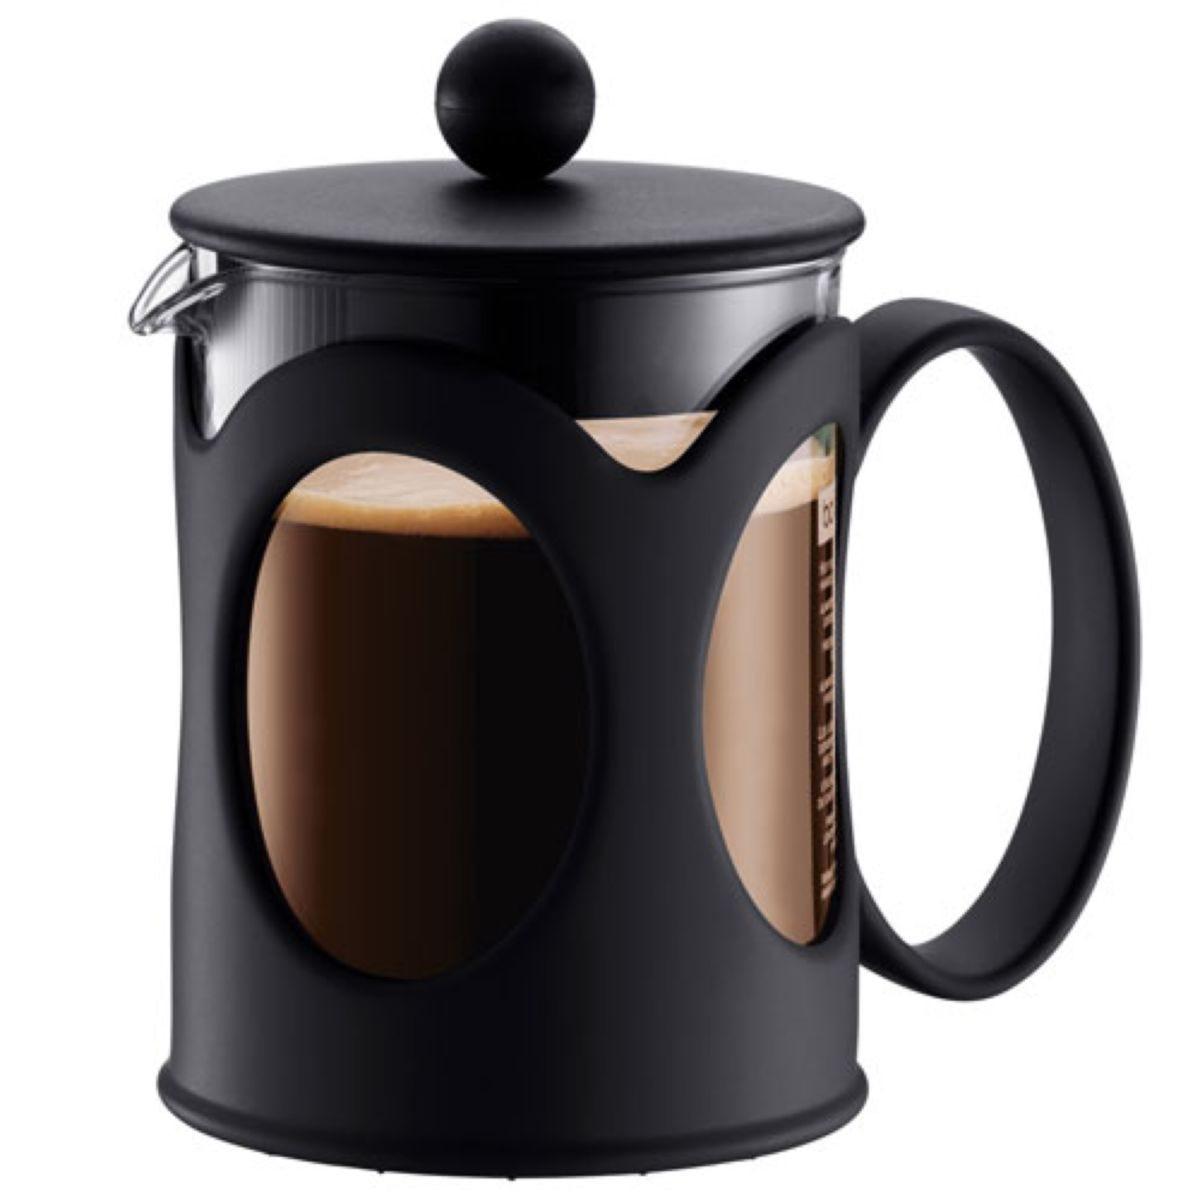 Bodum Kenya 4-Cup Cafetiere